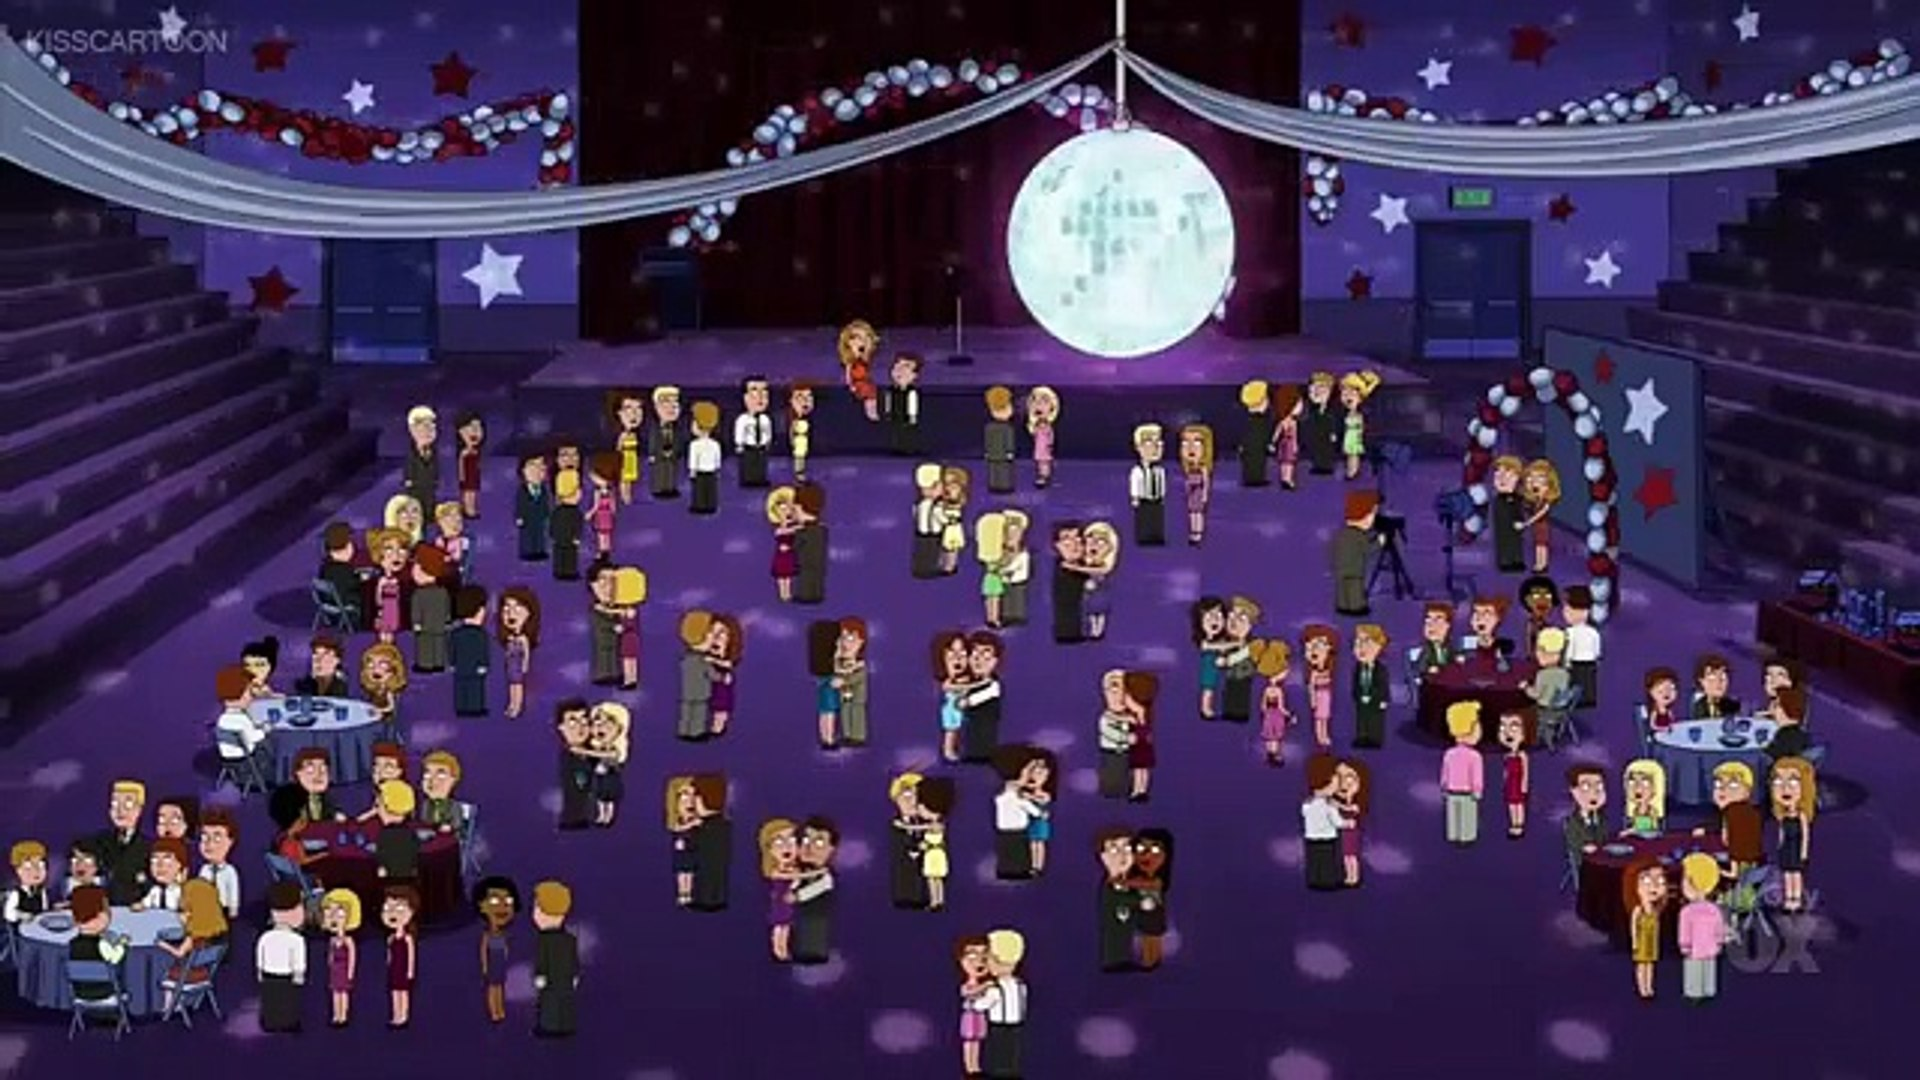 Family Guy - Herbert the Pervert Has A Date-3liSB05i3vU